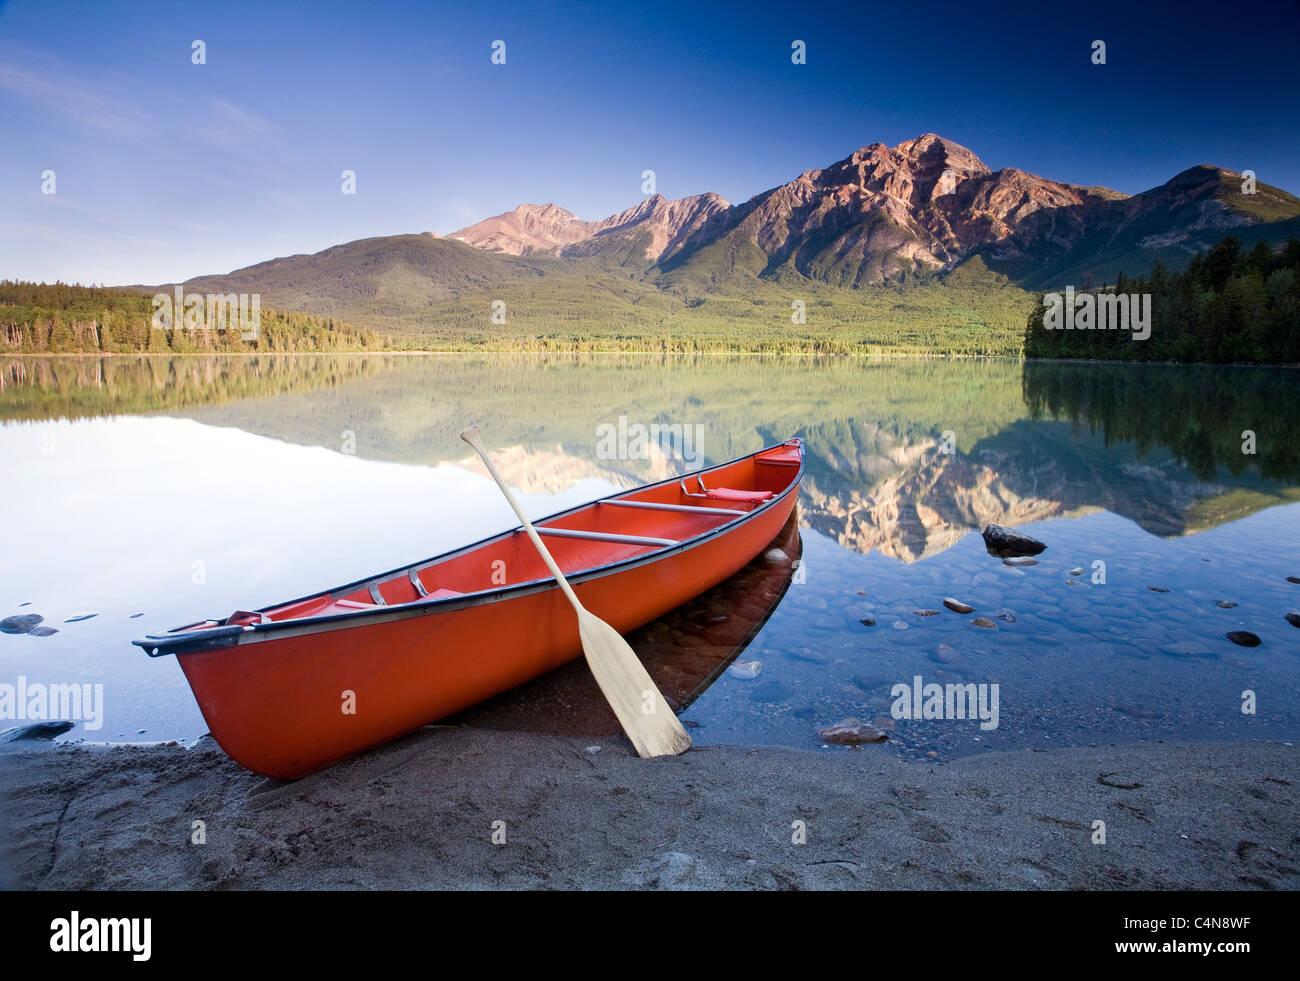 Red Canoe à l'aube sur le lac Pyramid, Jasper National Park, Alberta, Canada. Photo Stock